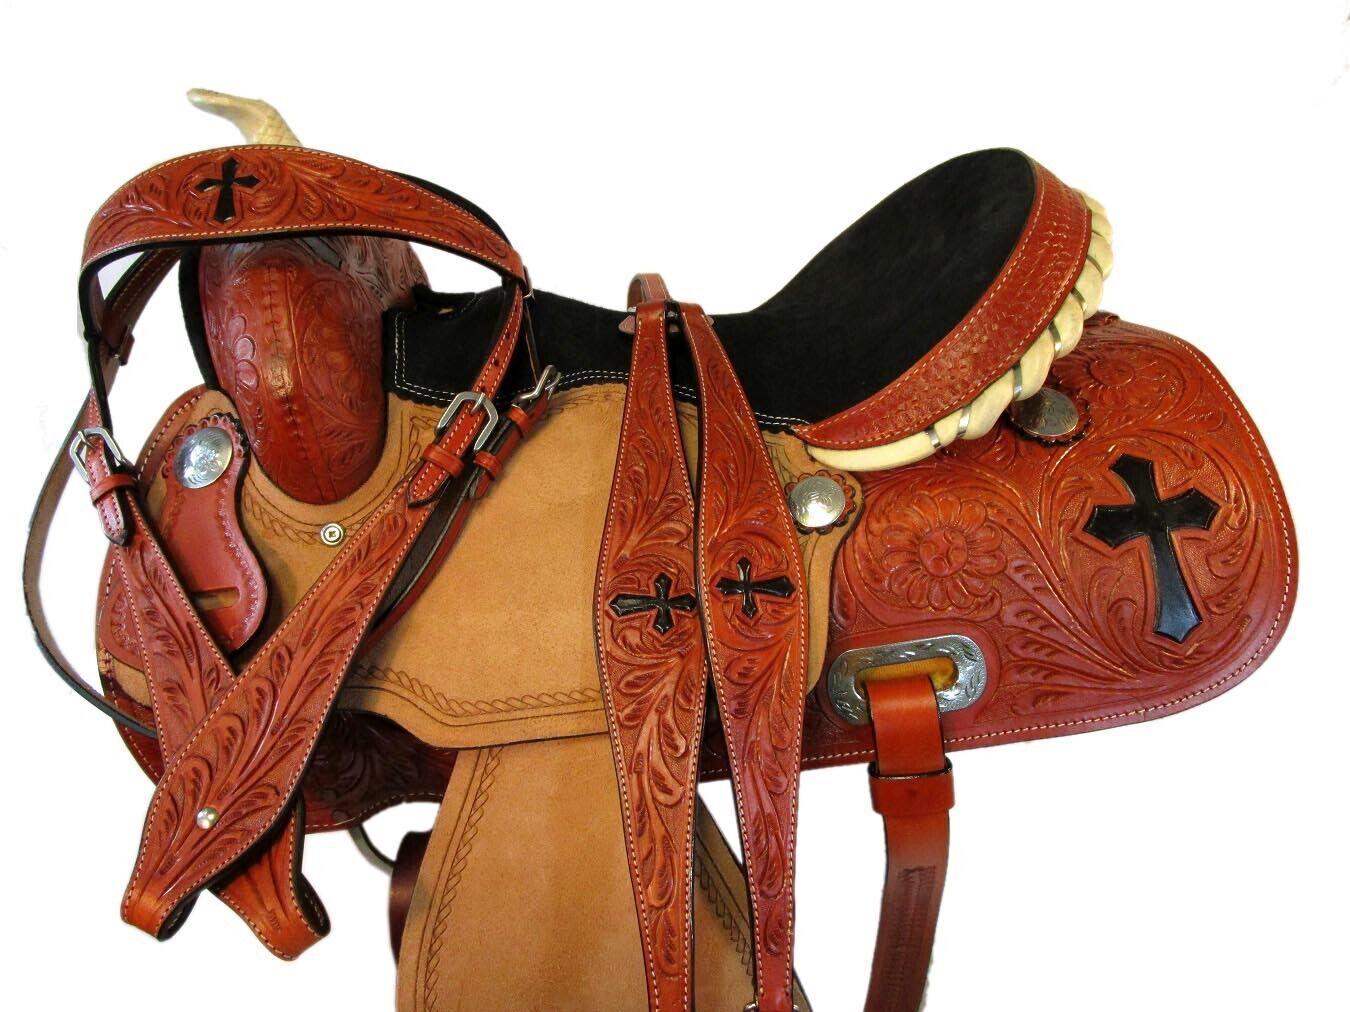 Comfy Sendero placer mostrar barril Cruz  silla caballo occidental 15  16  Tachuela  garantizado